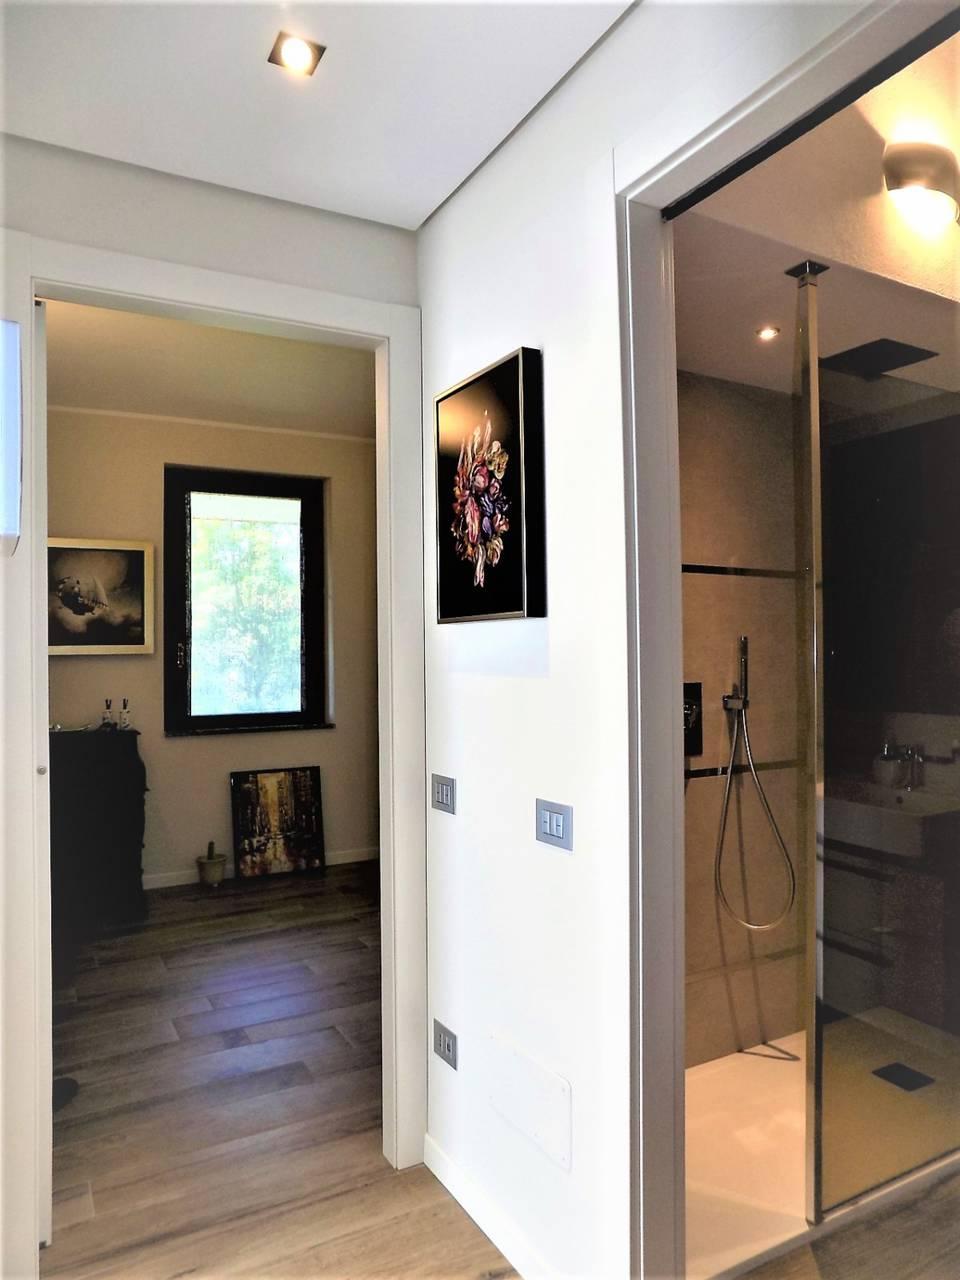 Porzione-villa-bifamigliare-ristrutturata-in-vendita-a-Carnate-20